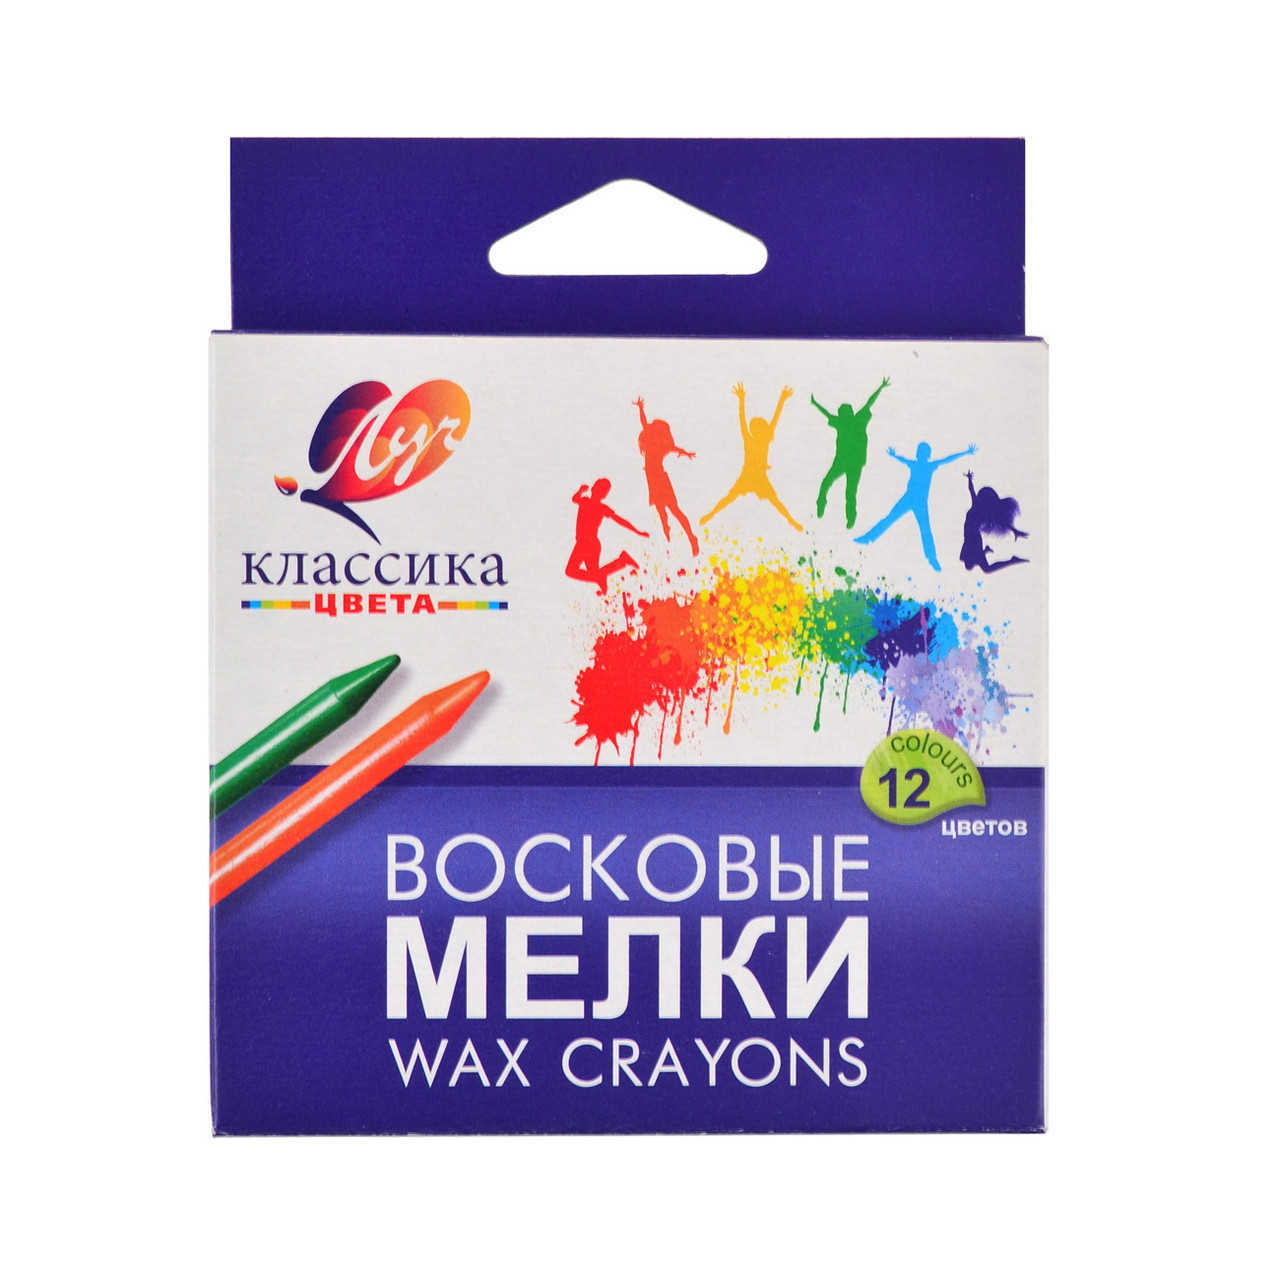 "Карандаш воск. круглый 12 цв.""Классика"" (8*90) 12C861-08"